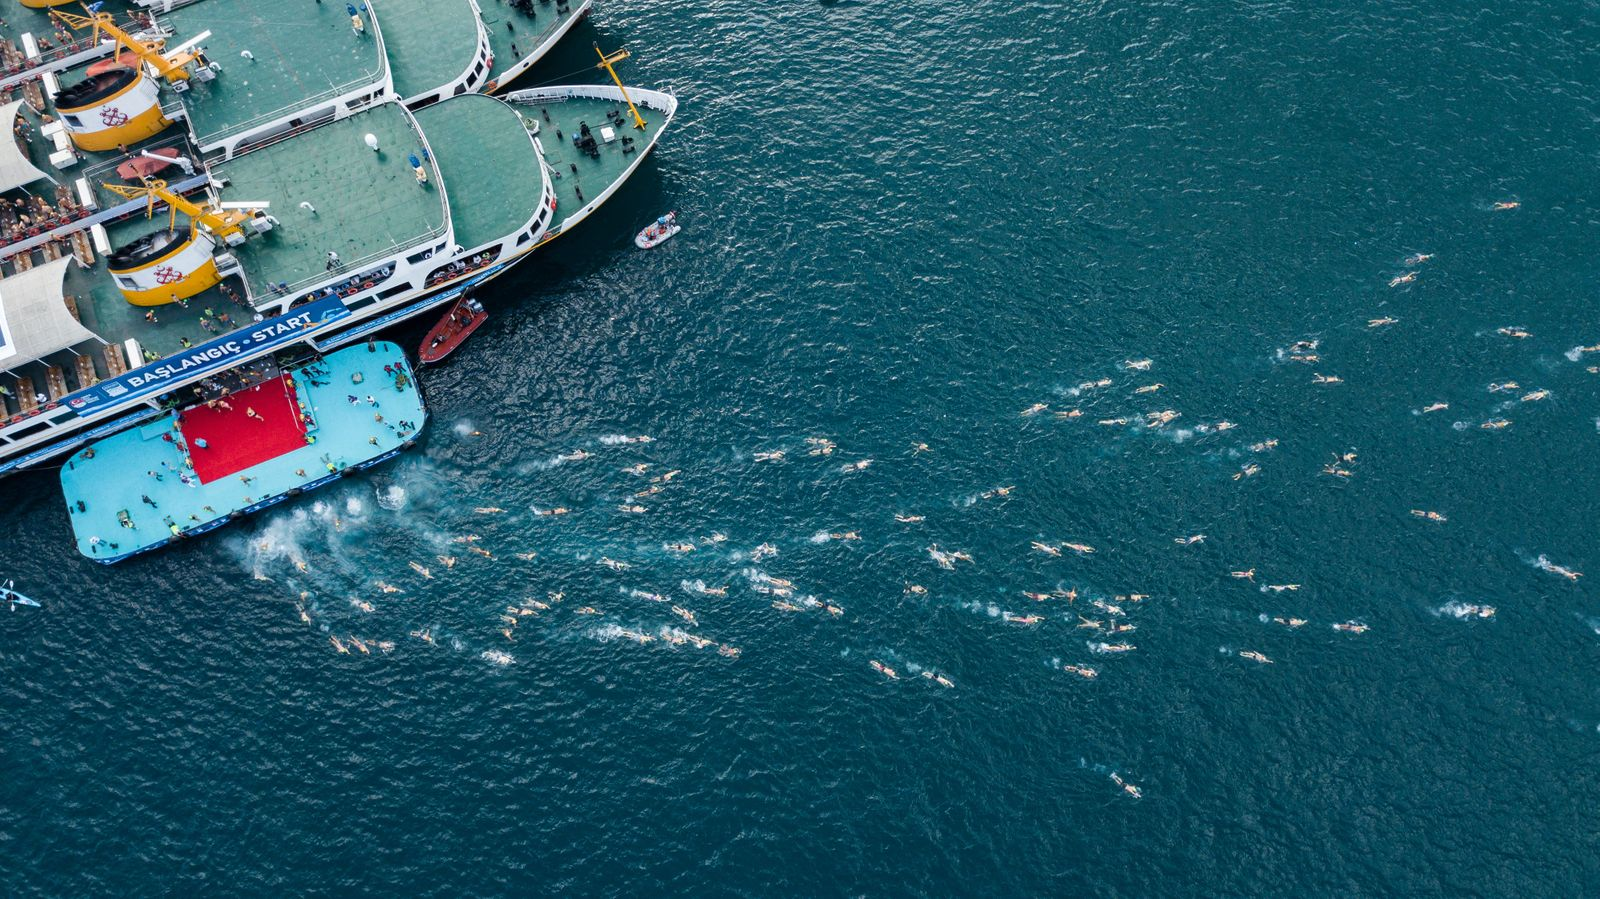 Bosphorus Cross-Continental Swimming Race in Istanbul, Turkey - 23 Aug 2020